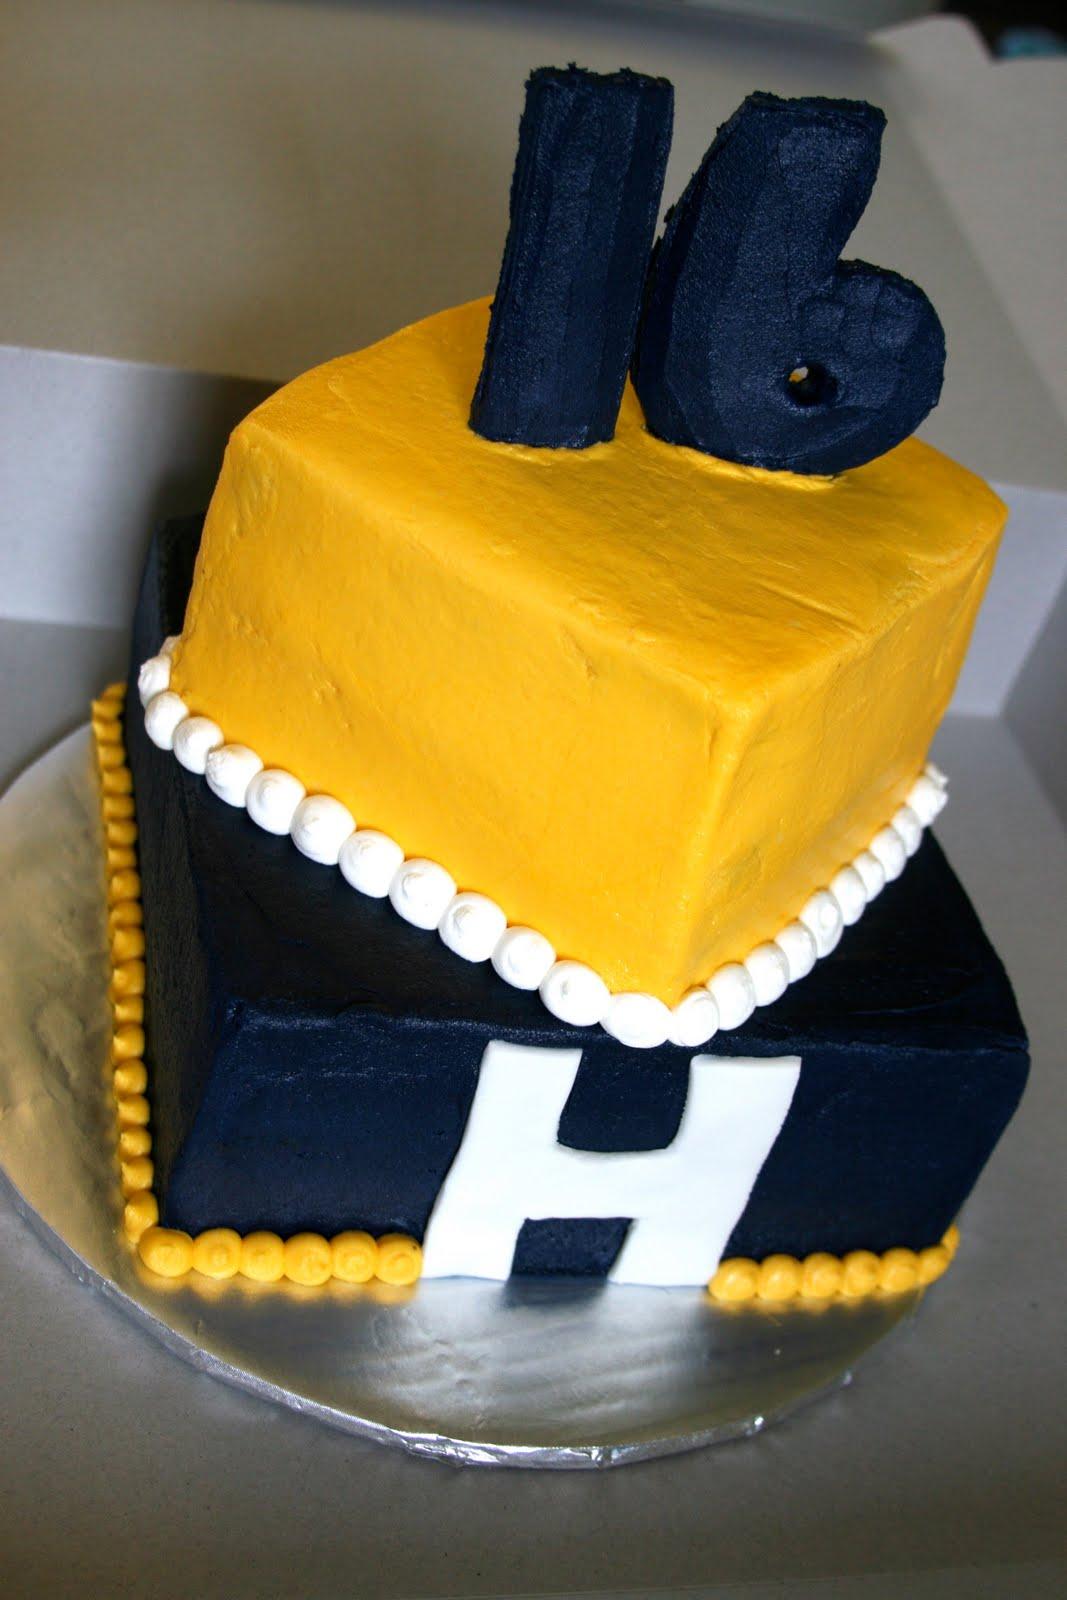 Birthday Cake Via 8 Year Old Boy